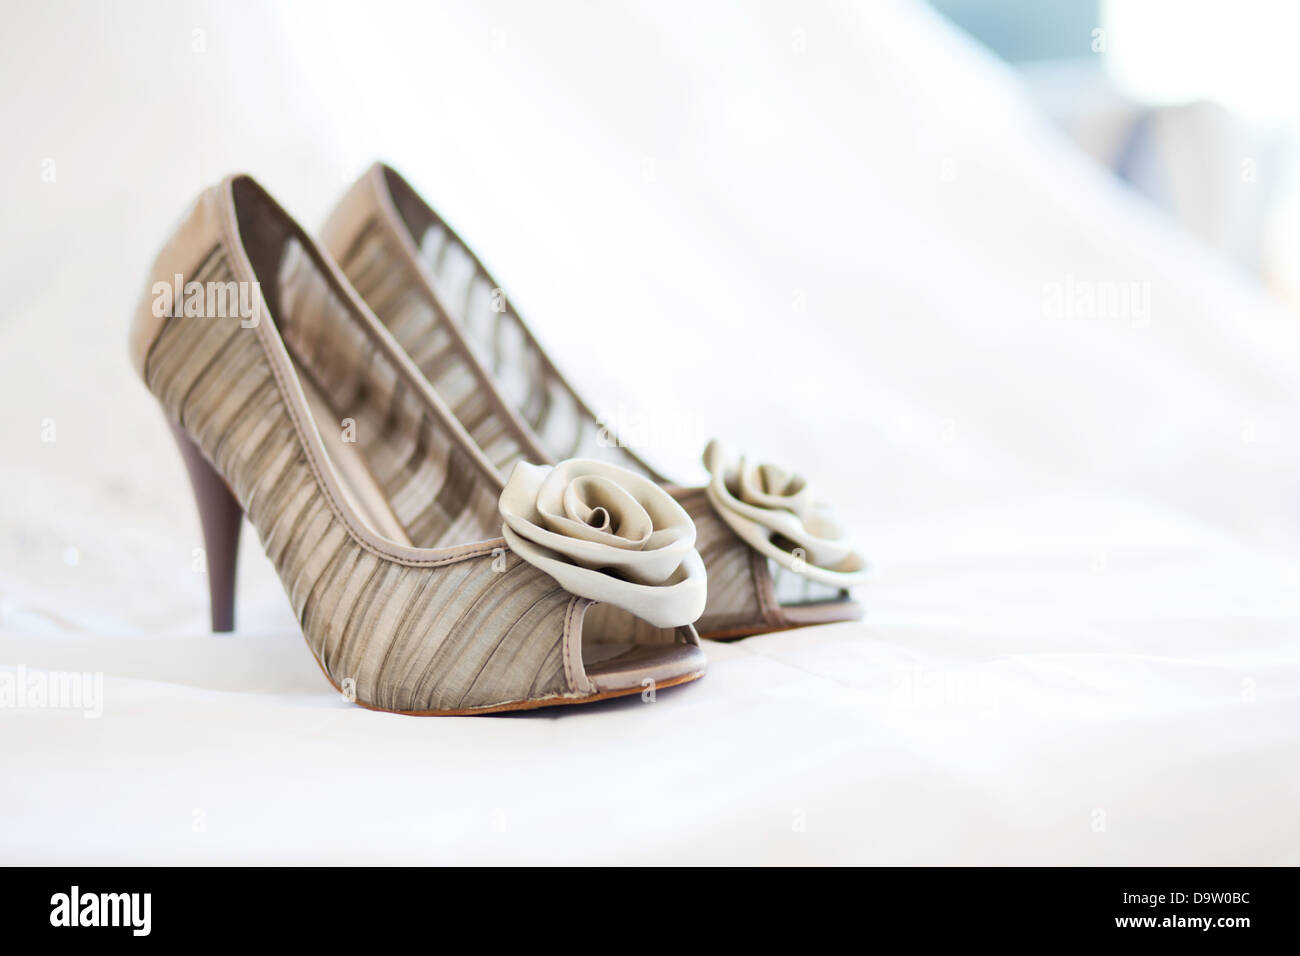 c401c4f9cc9 Modern Bridal Heels Stock Photos & Modern Bridal Heels Stock Images ...